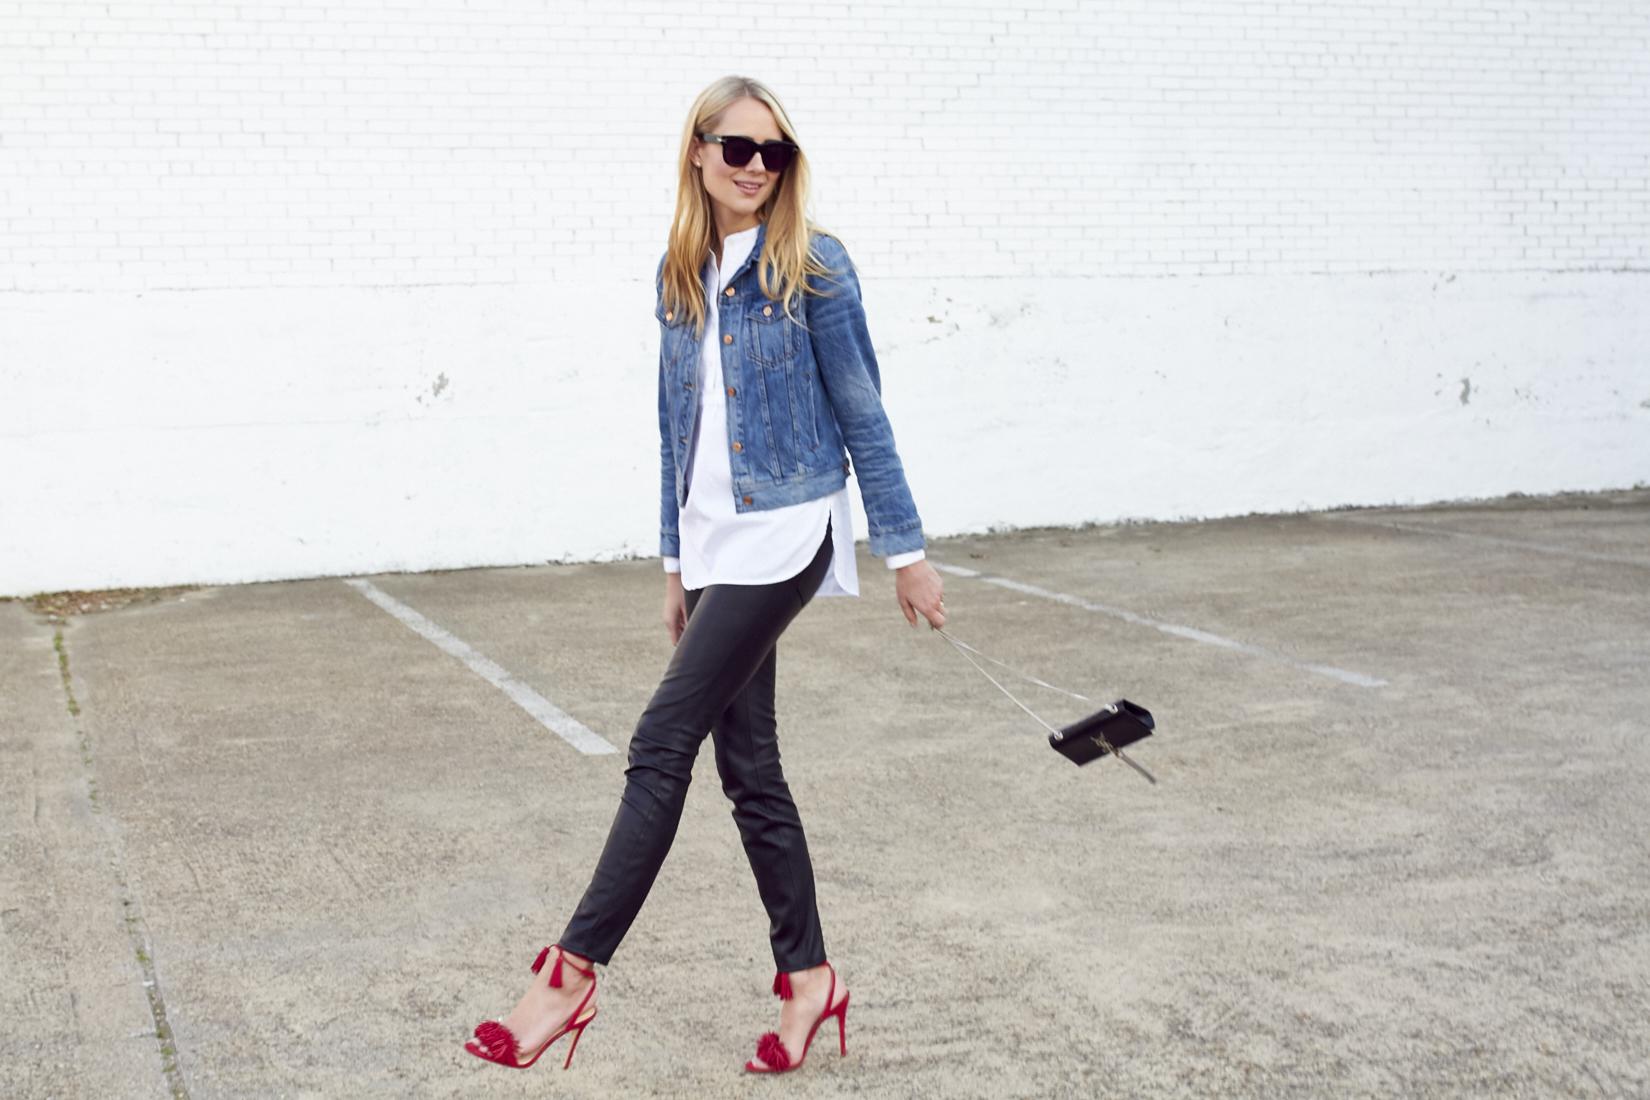 fashion-jackson-jcrew-denim-jacket-black-faux-leather-pants-red-fringe-heels